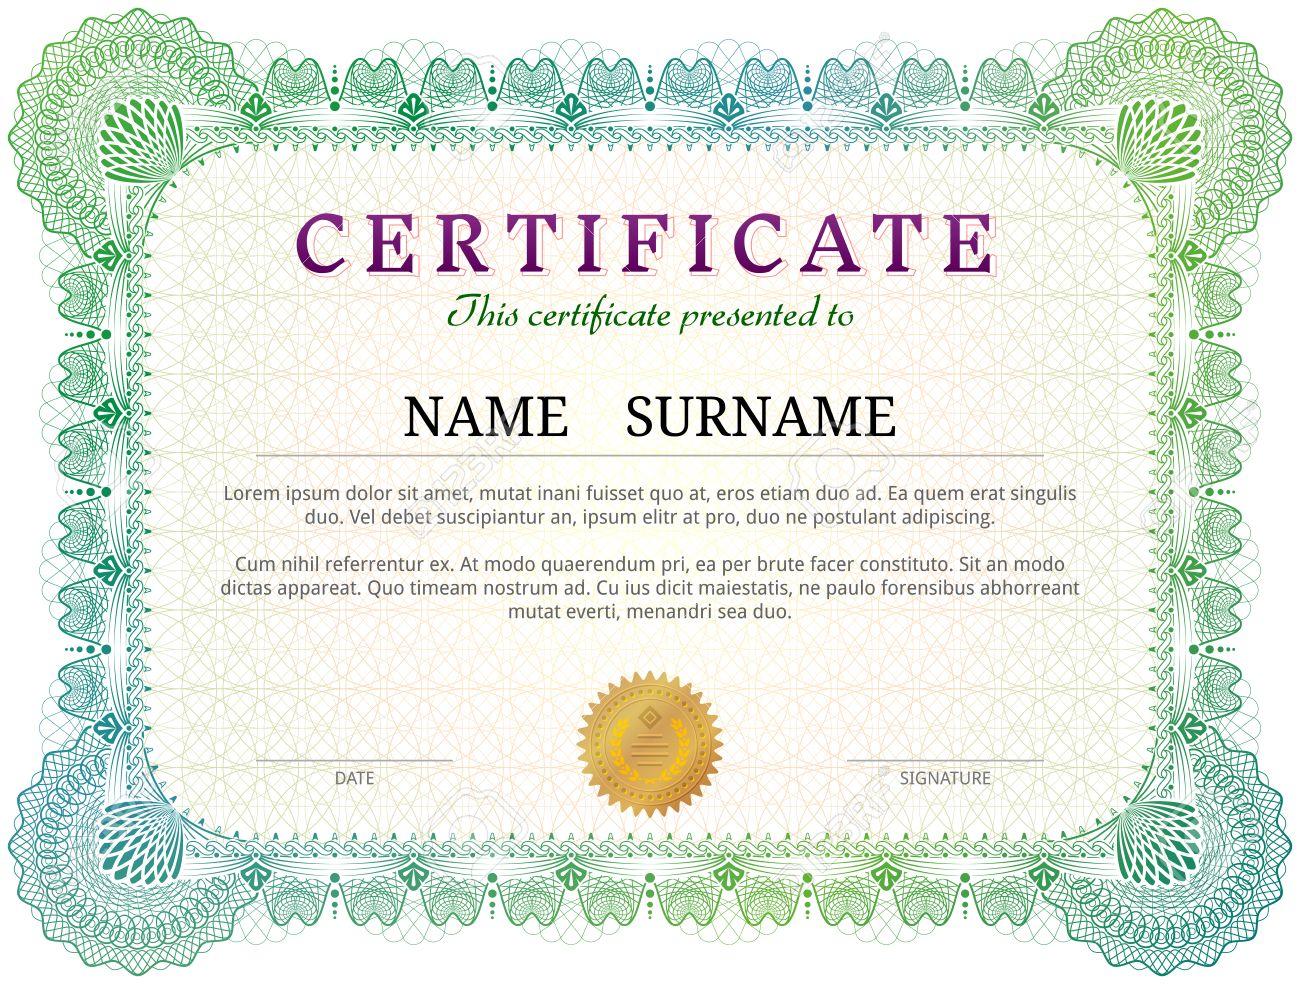 Certificate template with guilloche elements green diploma border certificate template with guilloche elements green diploma border design for personal conferment qualitative vector alramifo Gallery